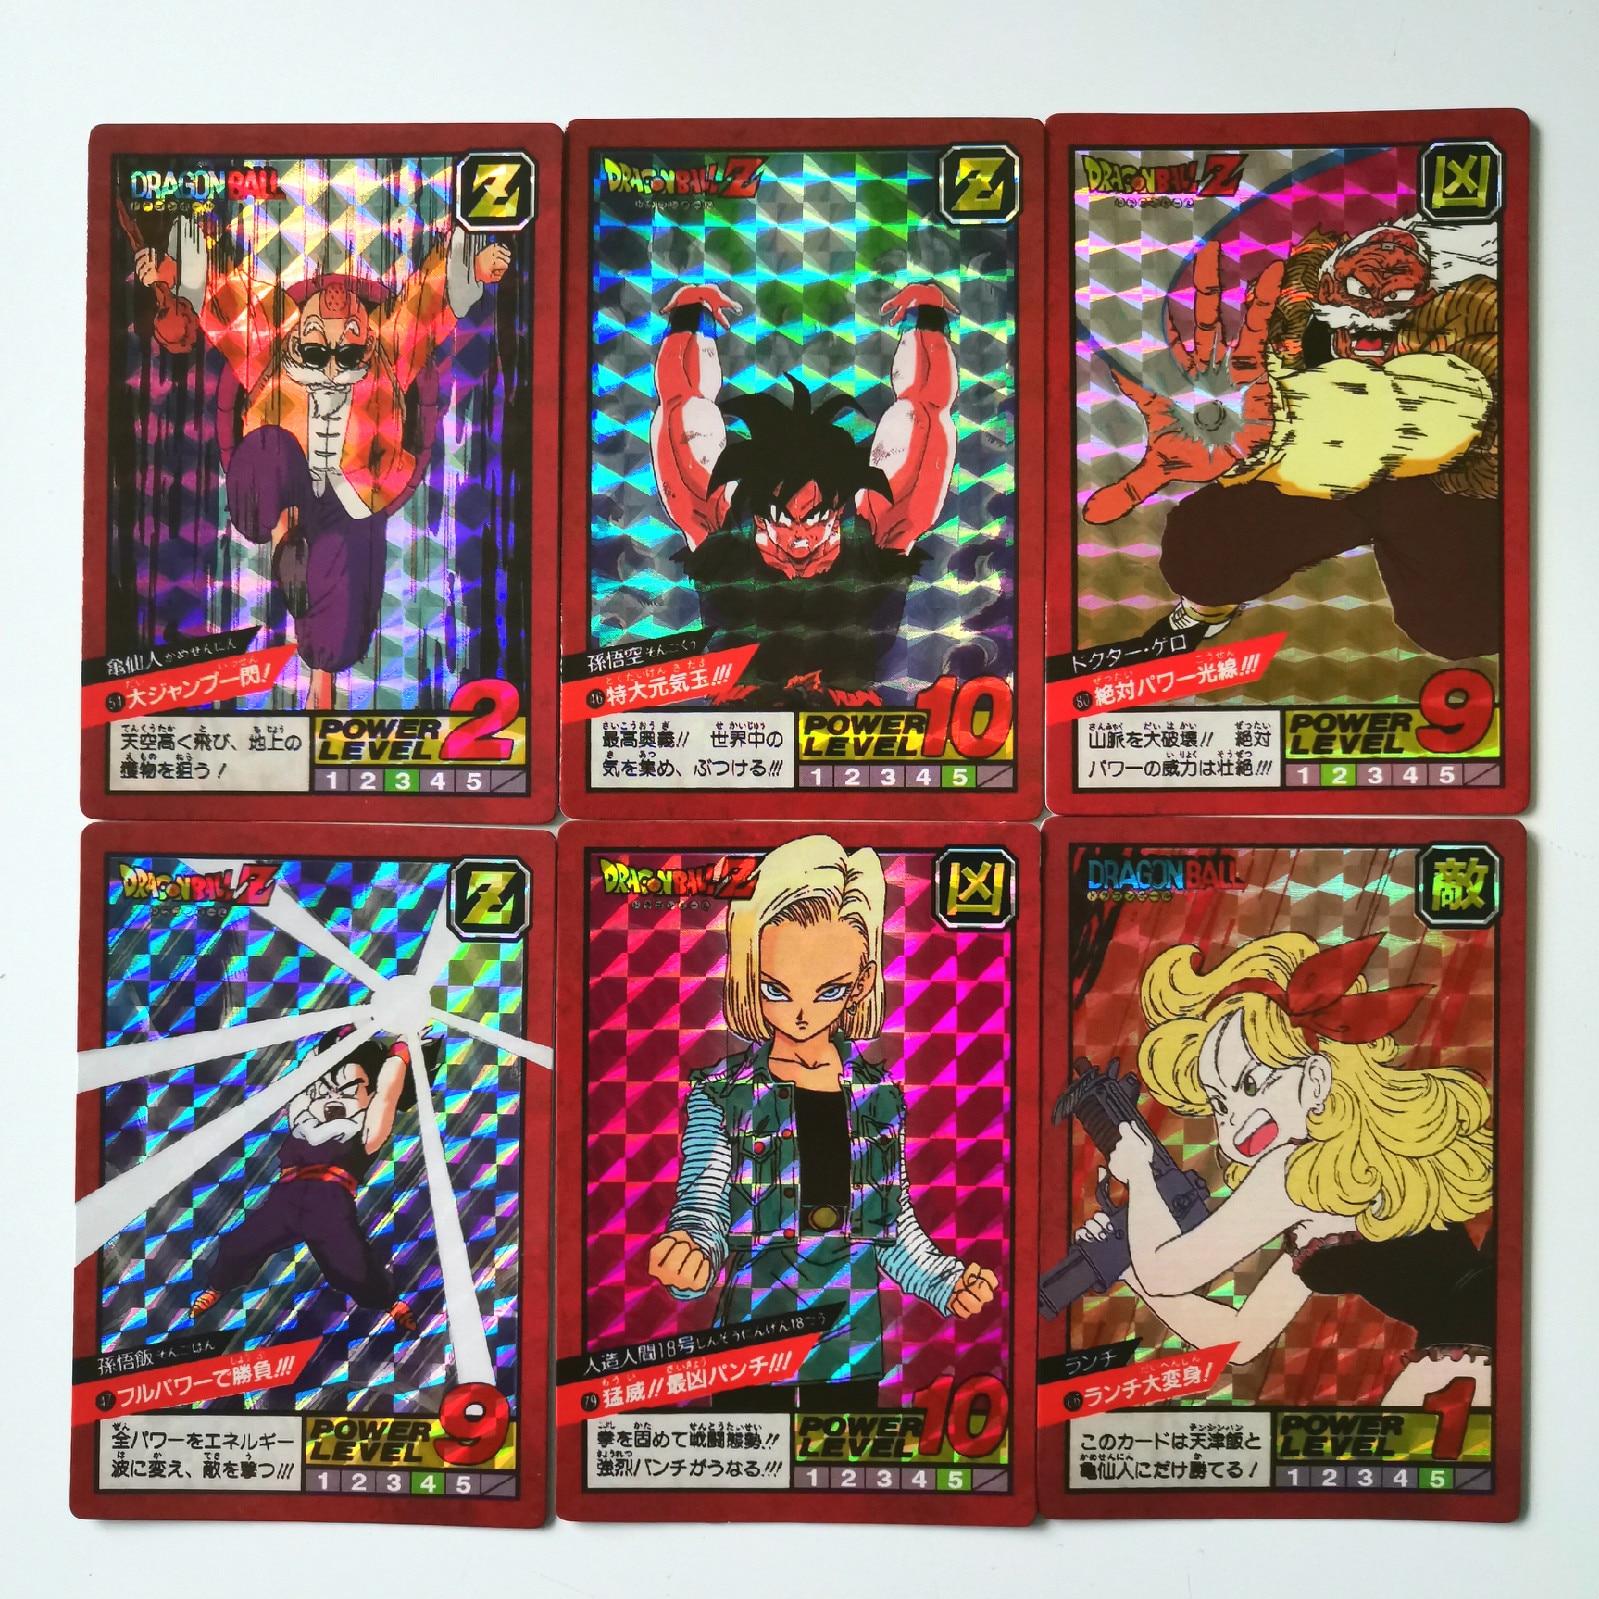 43pcs/set Super Dragon Ball Z Fighting 2 Reissue Heroes Battle Card Ultra Instinct Goku Vegeta Game Collection Cards